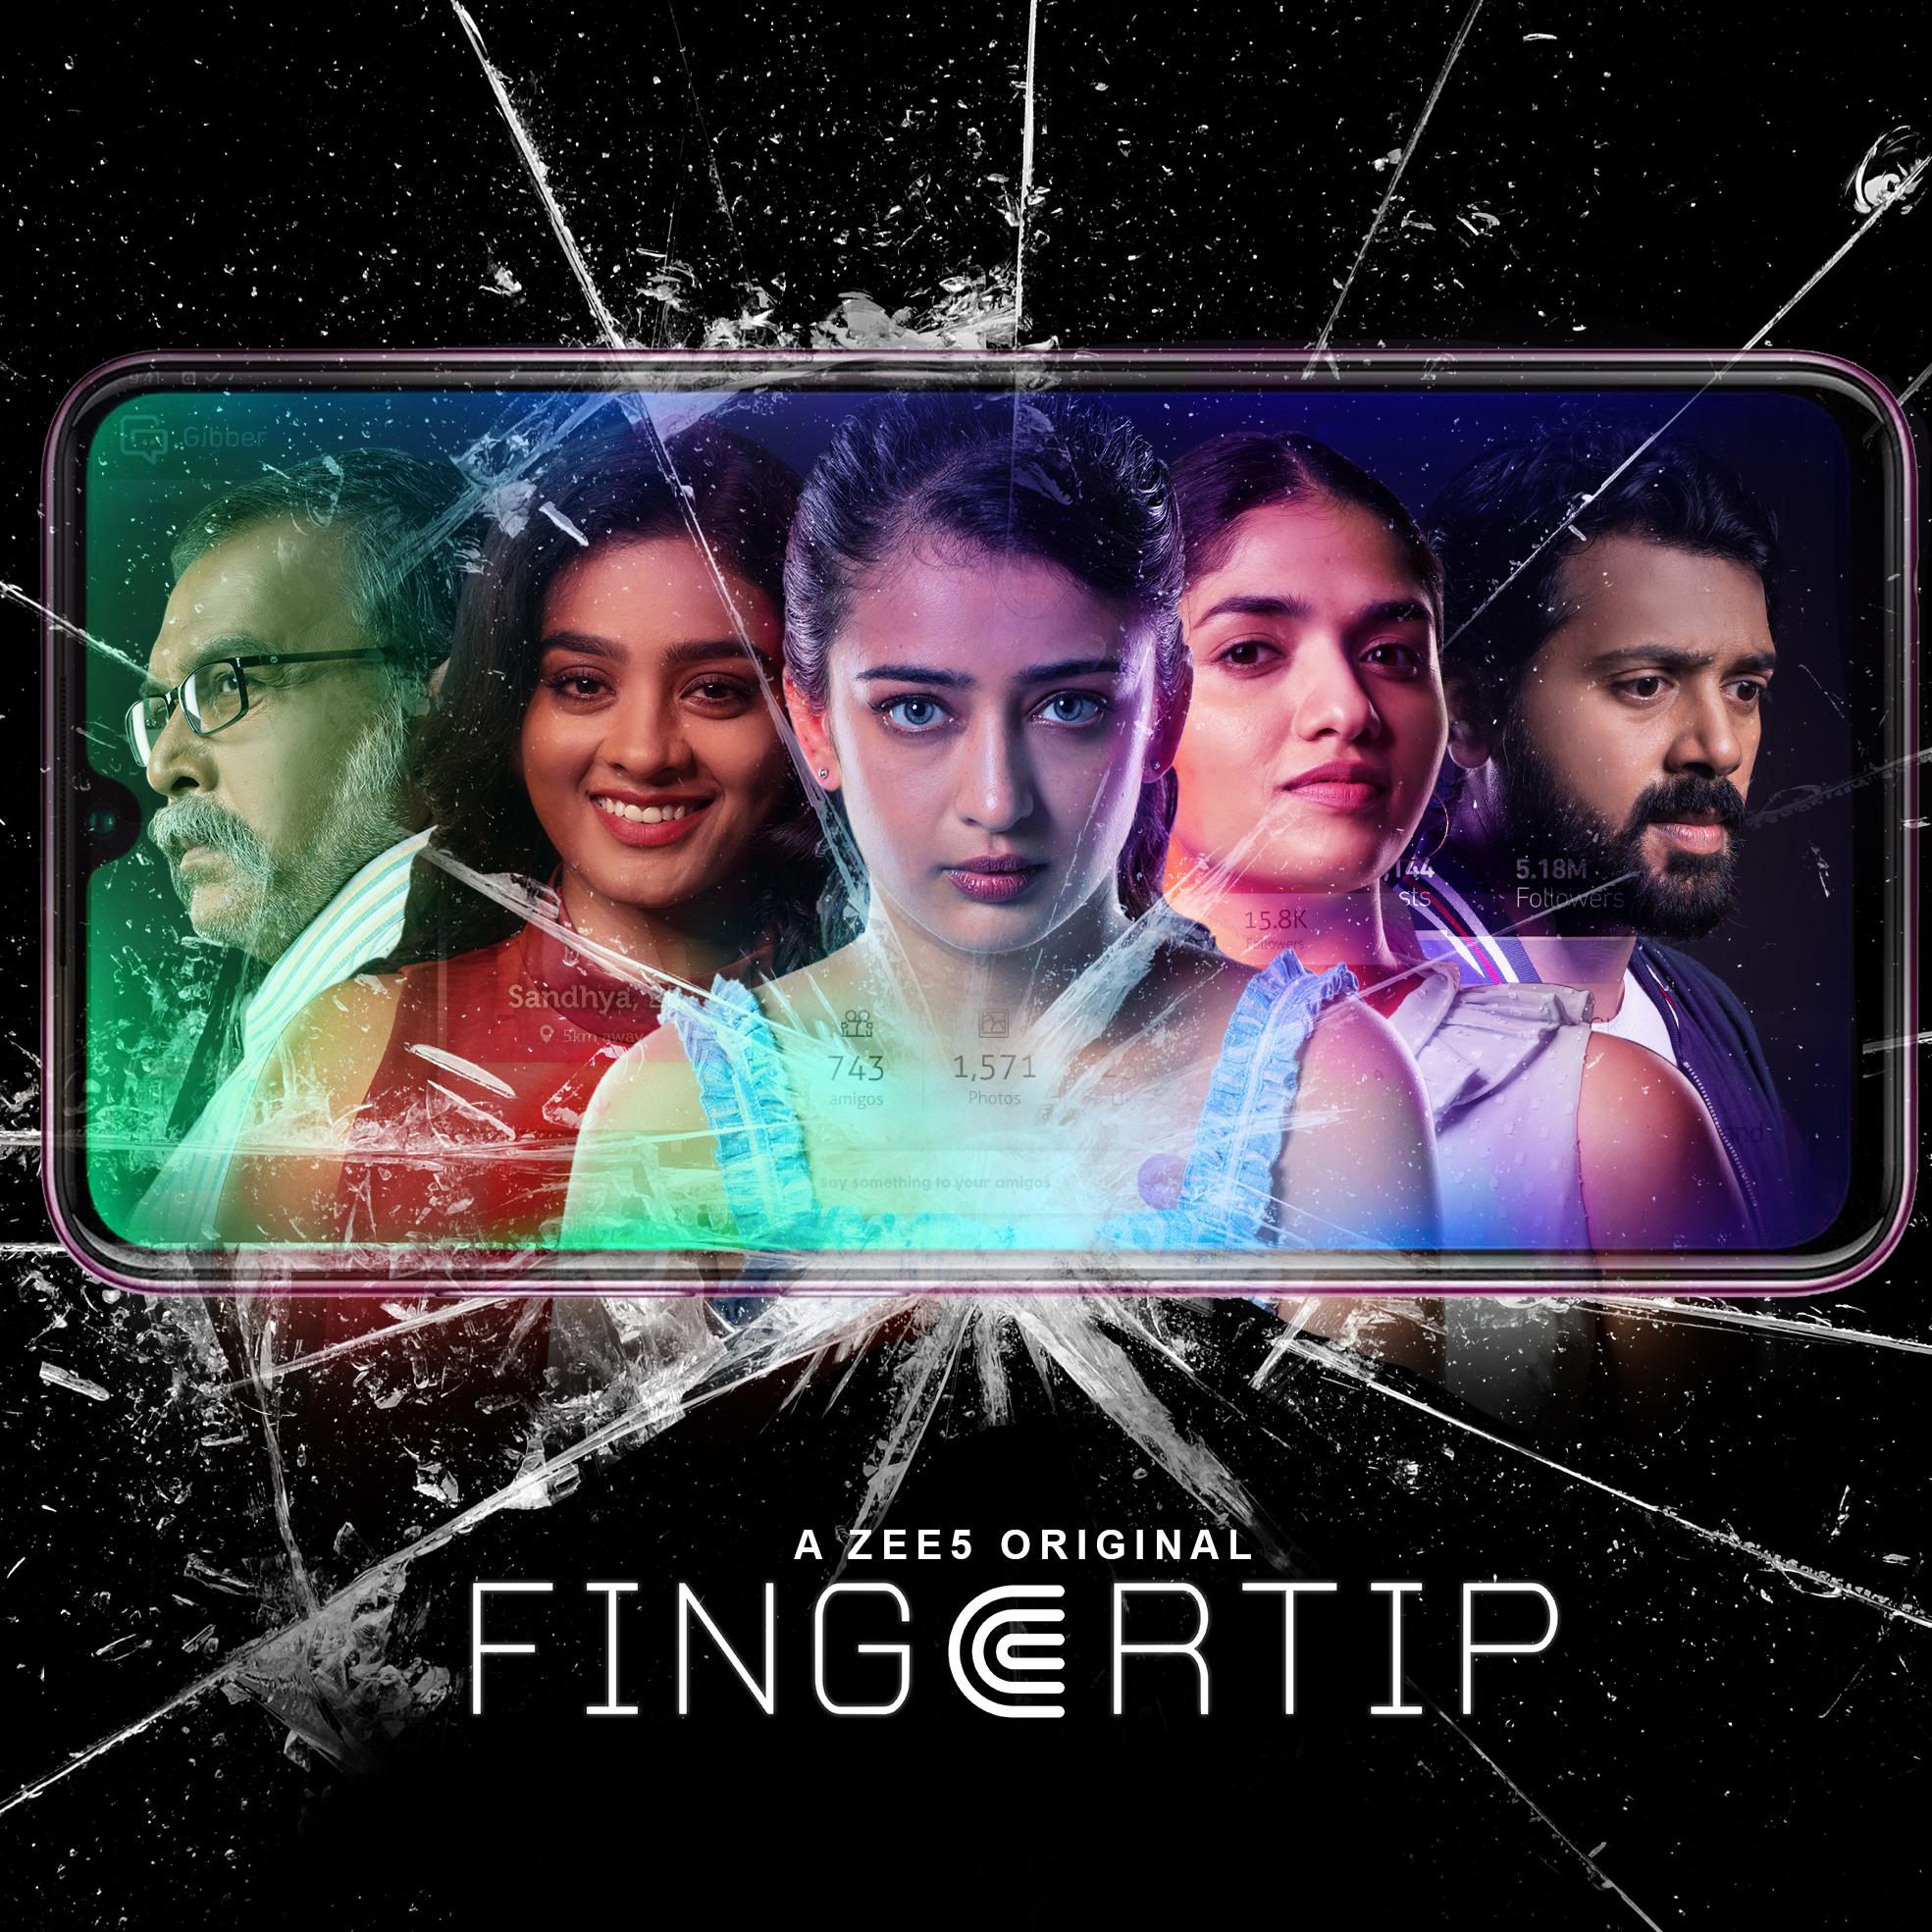 Fingertip (TV Series 2019– ) - IMDb